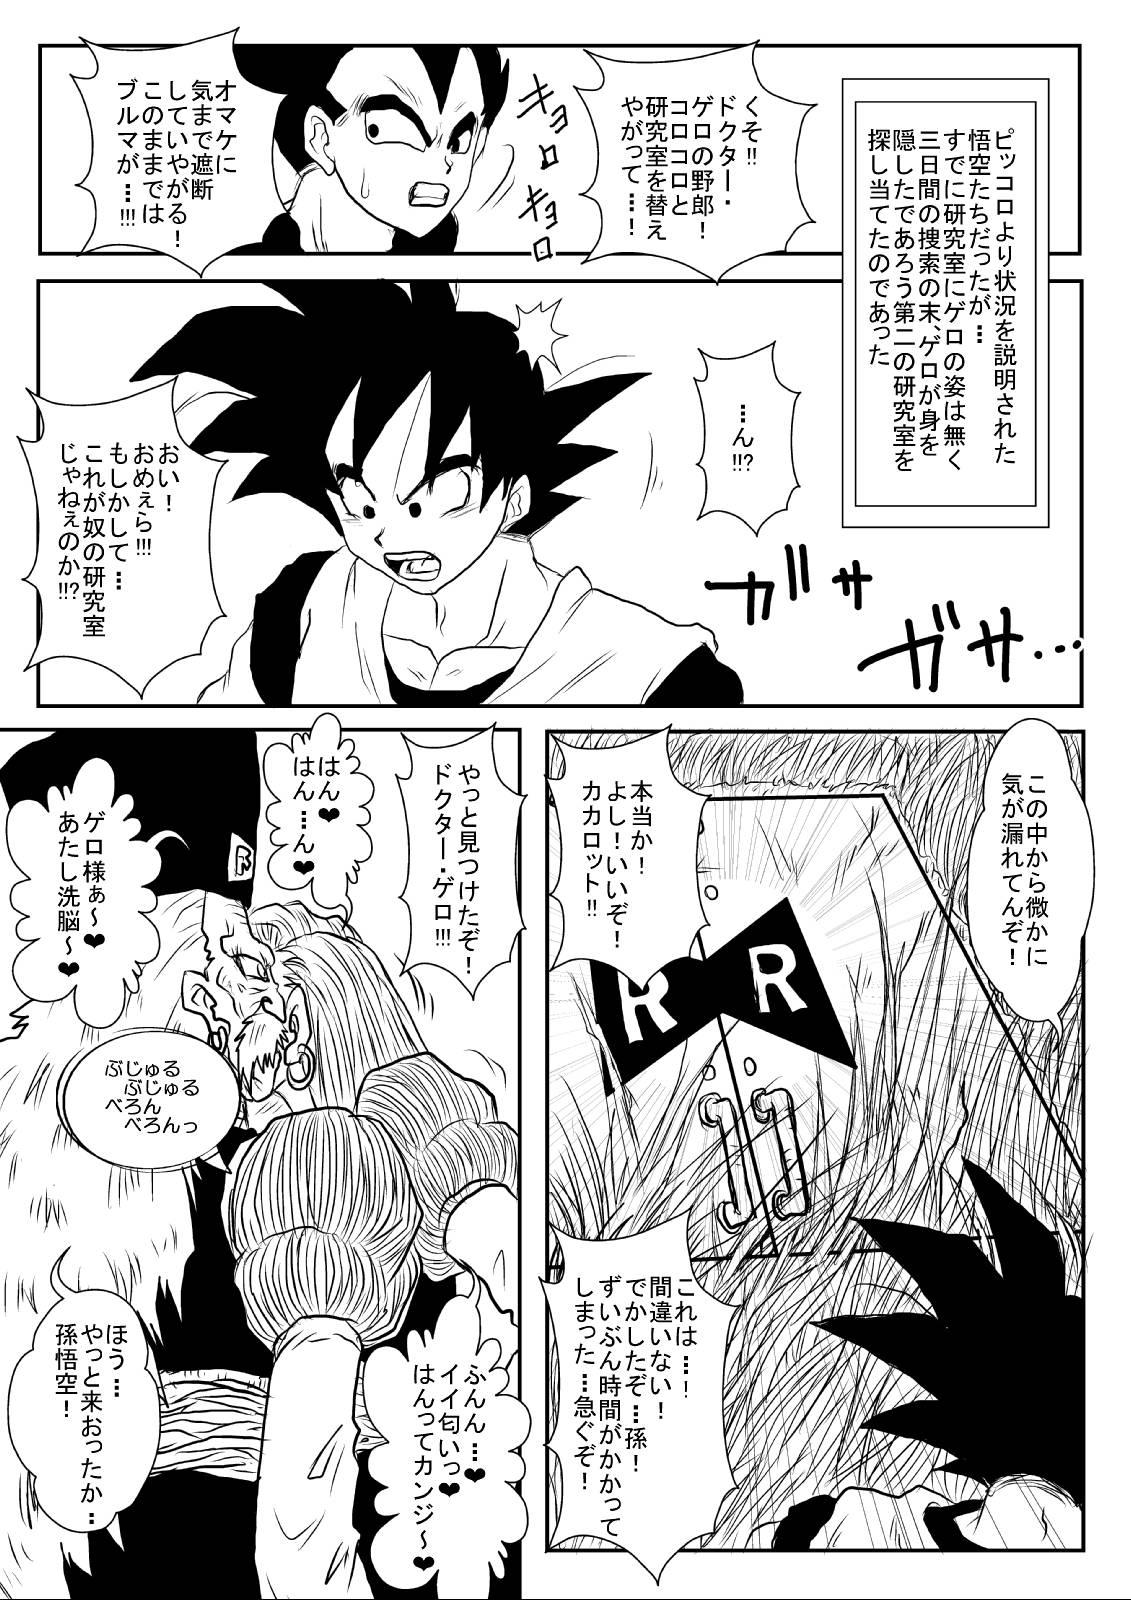 [Alice.Blood] Sennou Kyouiku-shitsu~ Jinzou ☆-kan 18-gou-hen (Dragon Ball Z) 35